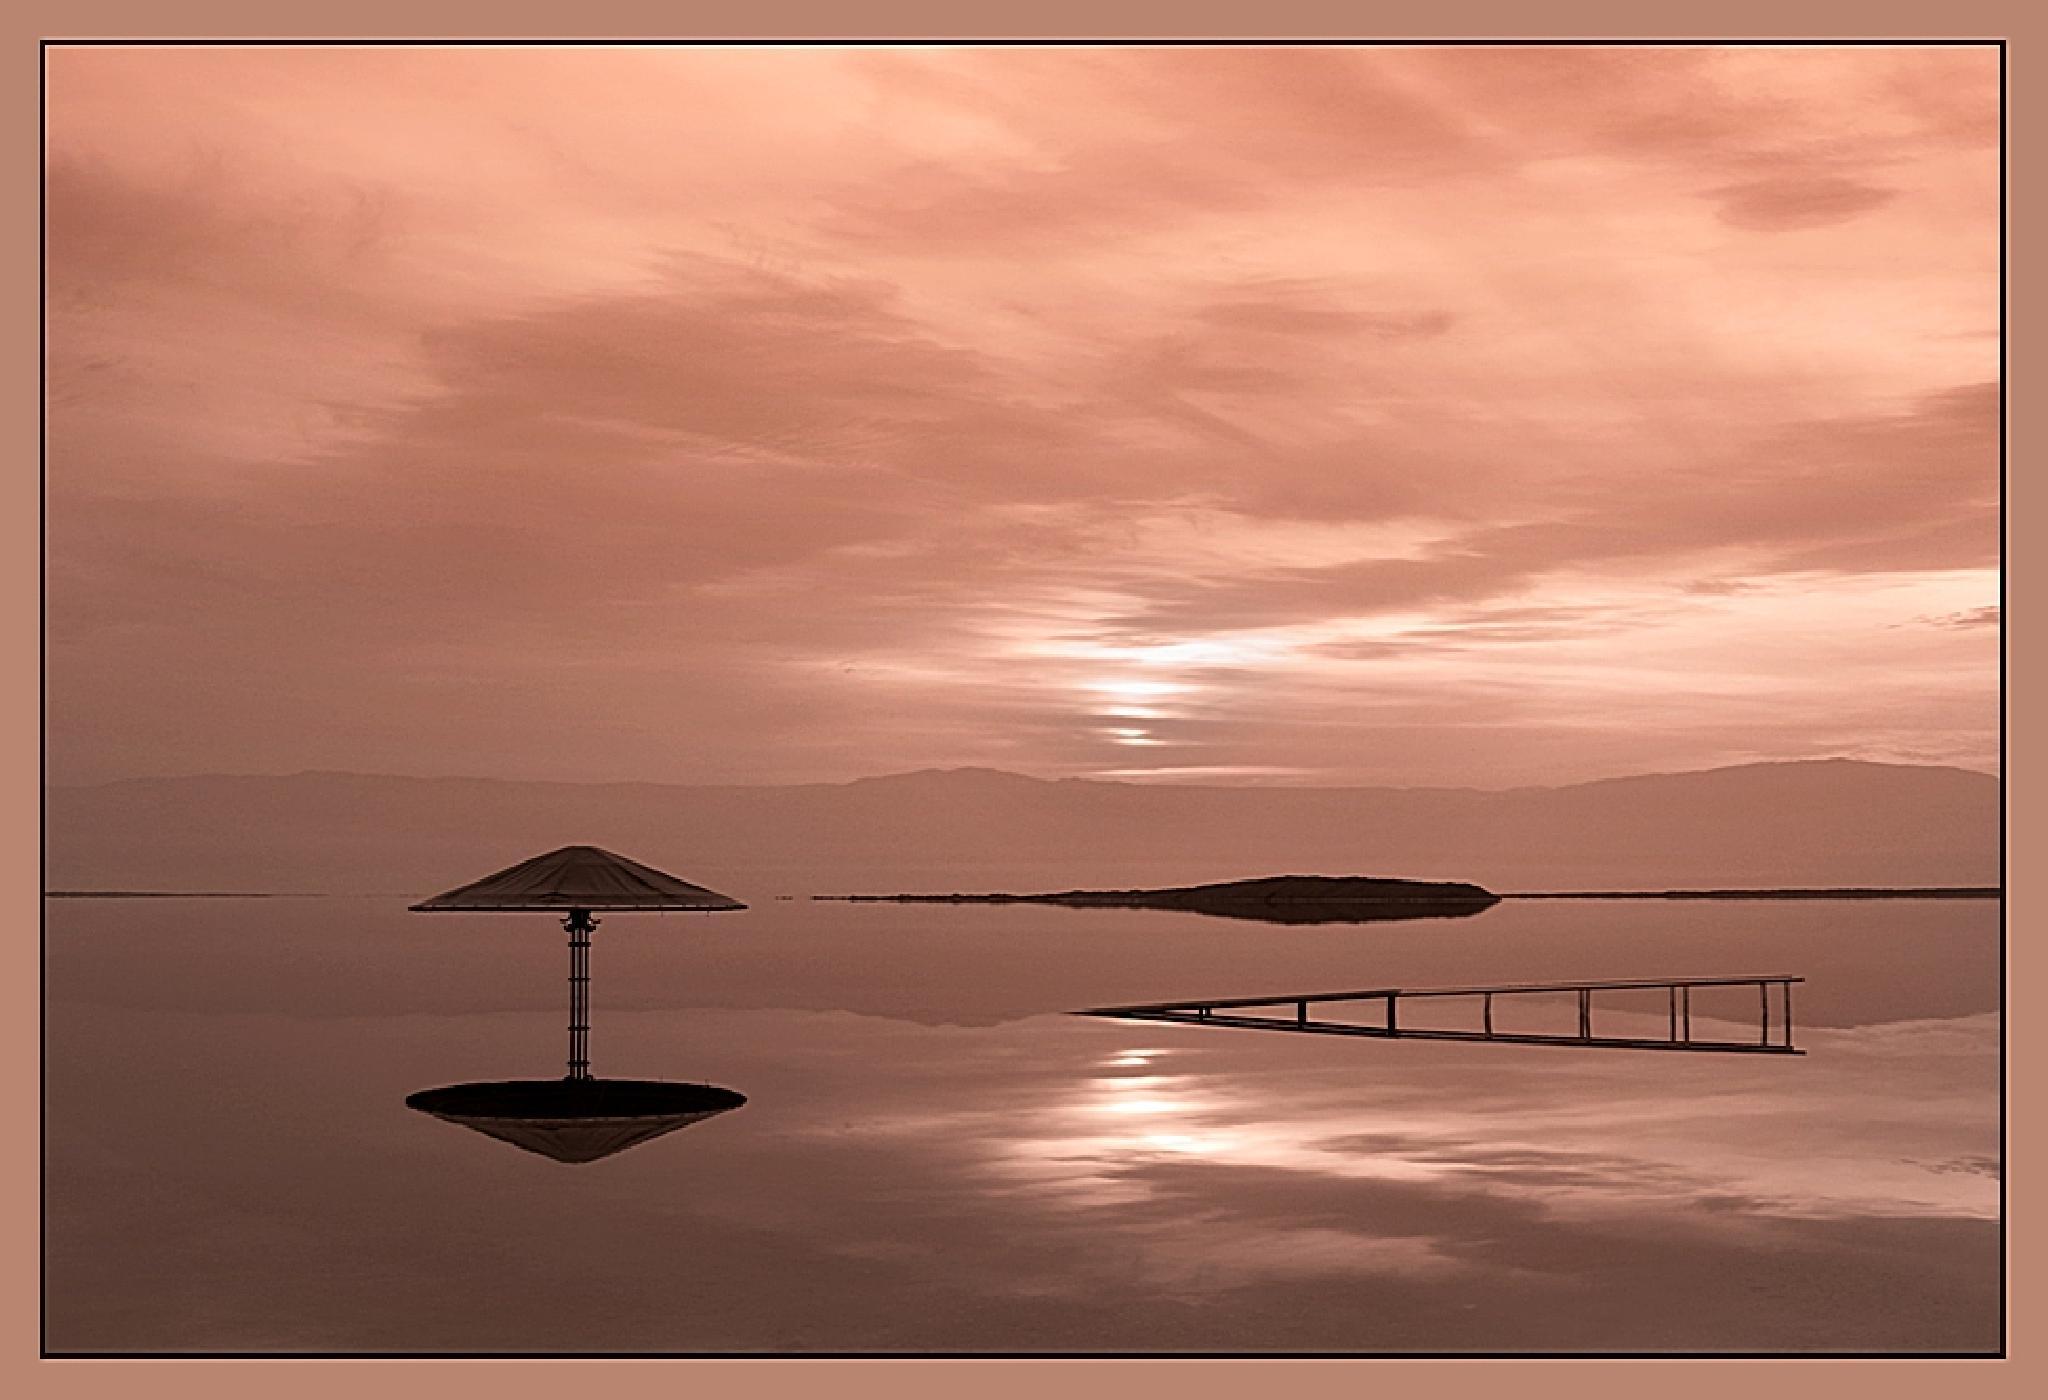 The Dead Sea, Sunrise by David Solodar